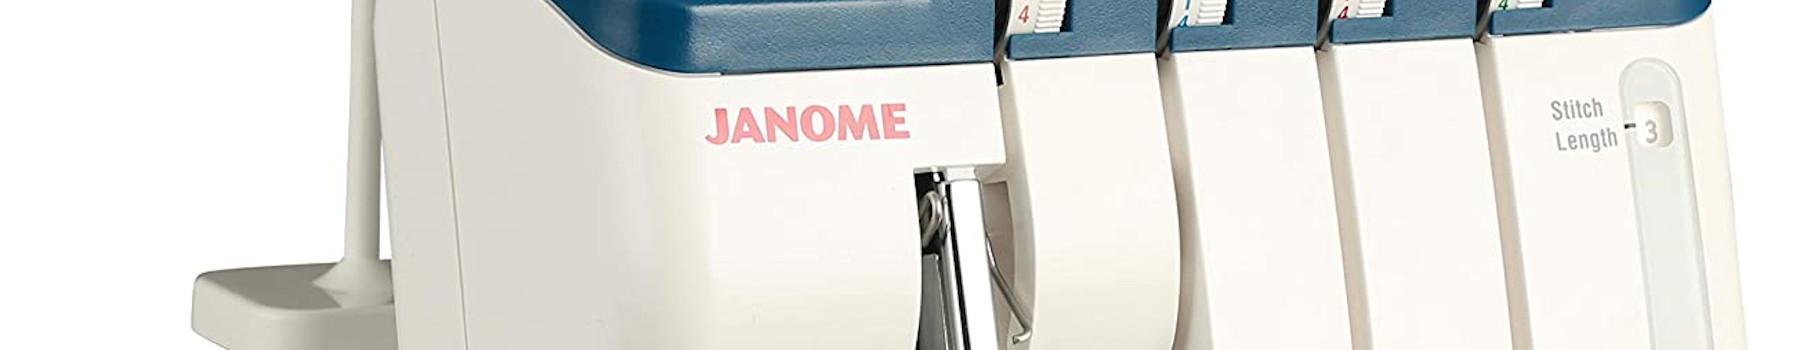 Janome FA4 Serger Machine